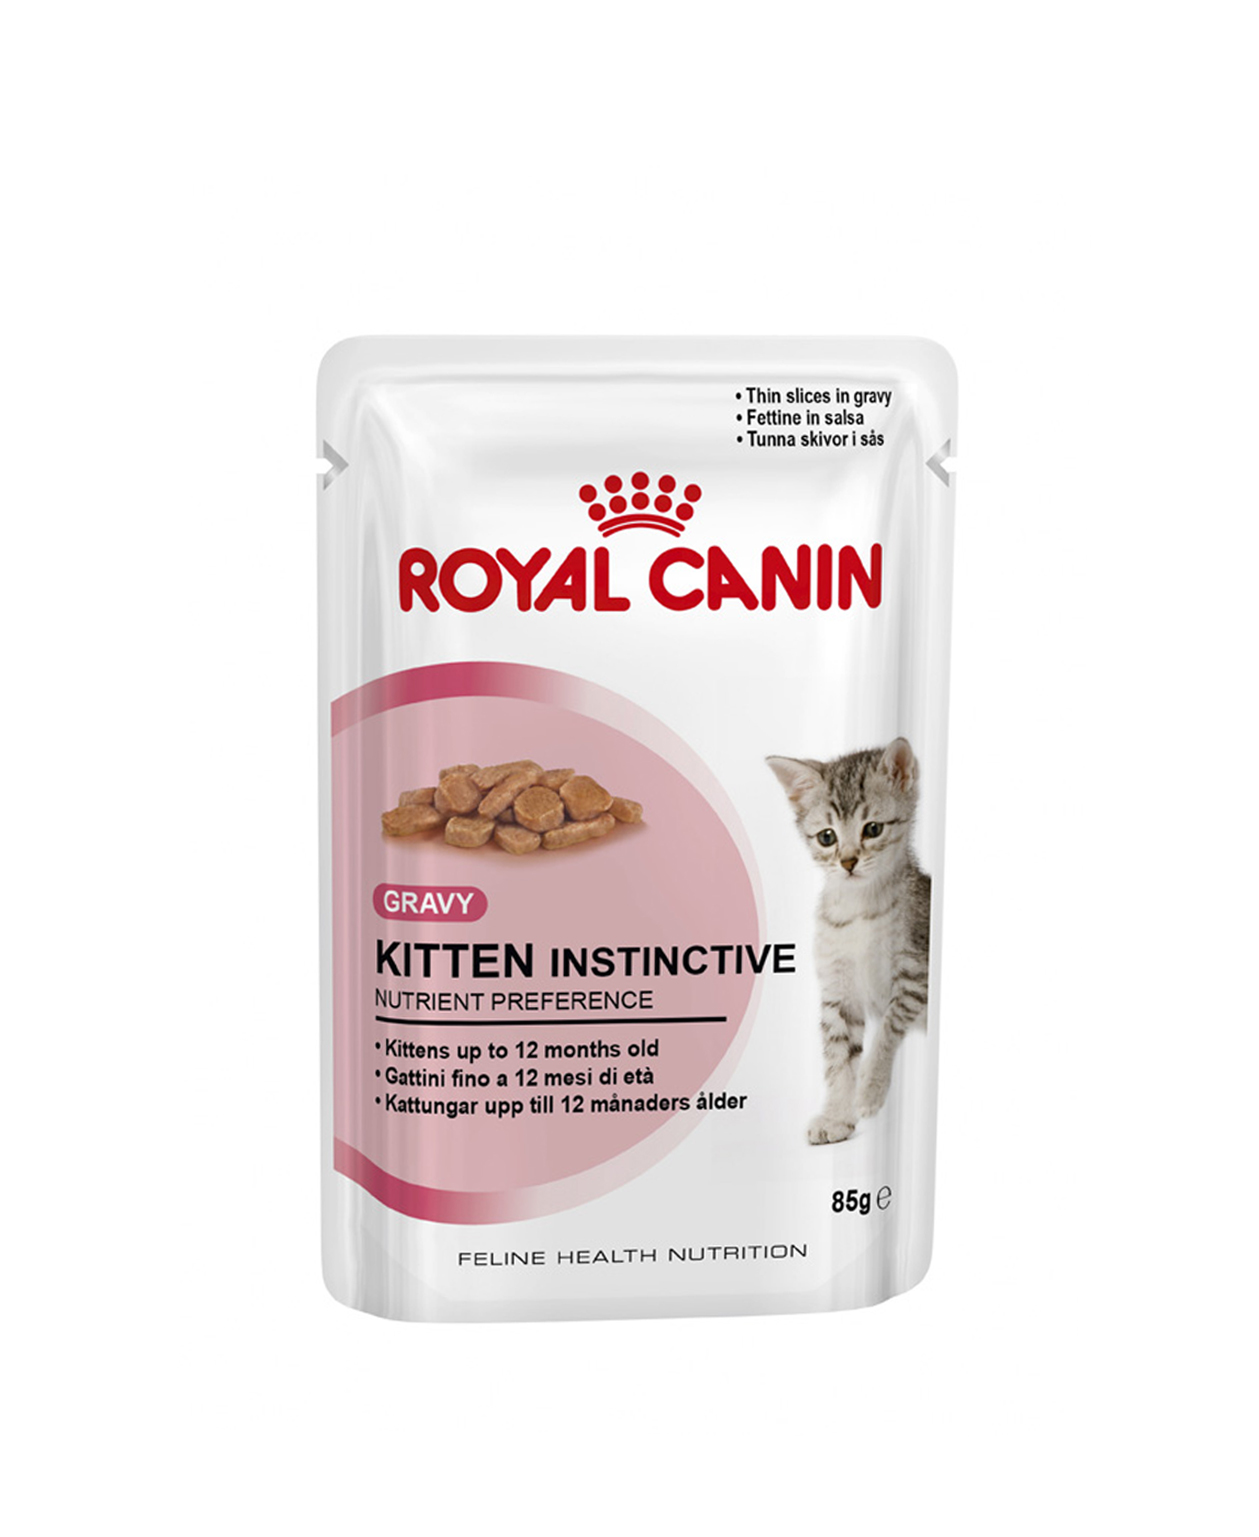 Bouchées en Sauce Royal Canin Kitten Instinctive 12x85g pour chatons